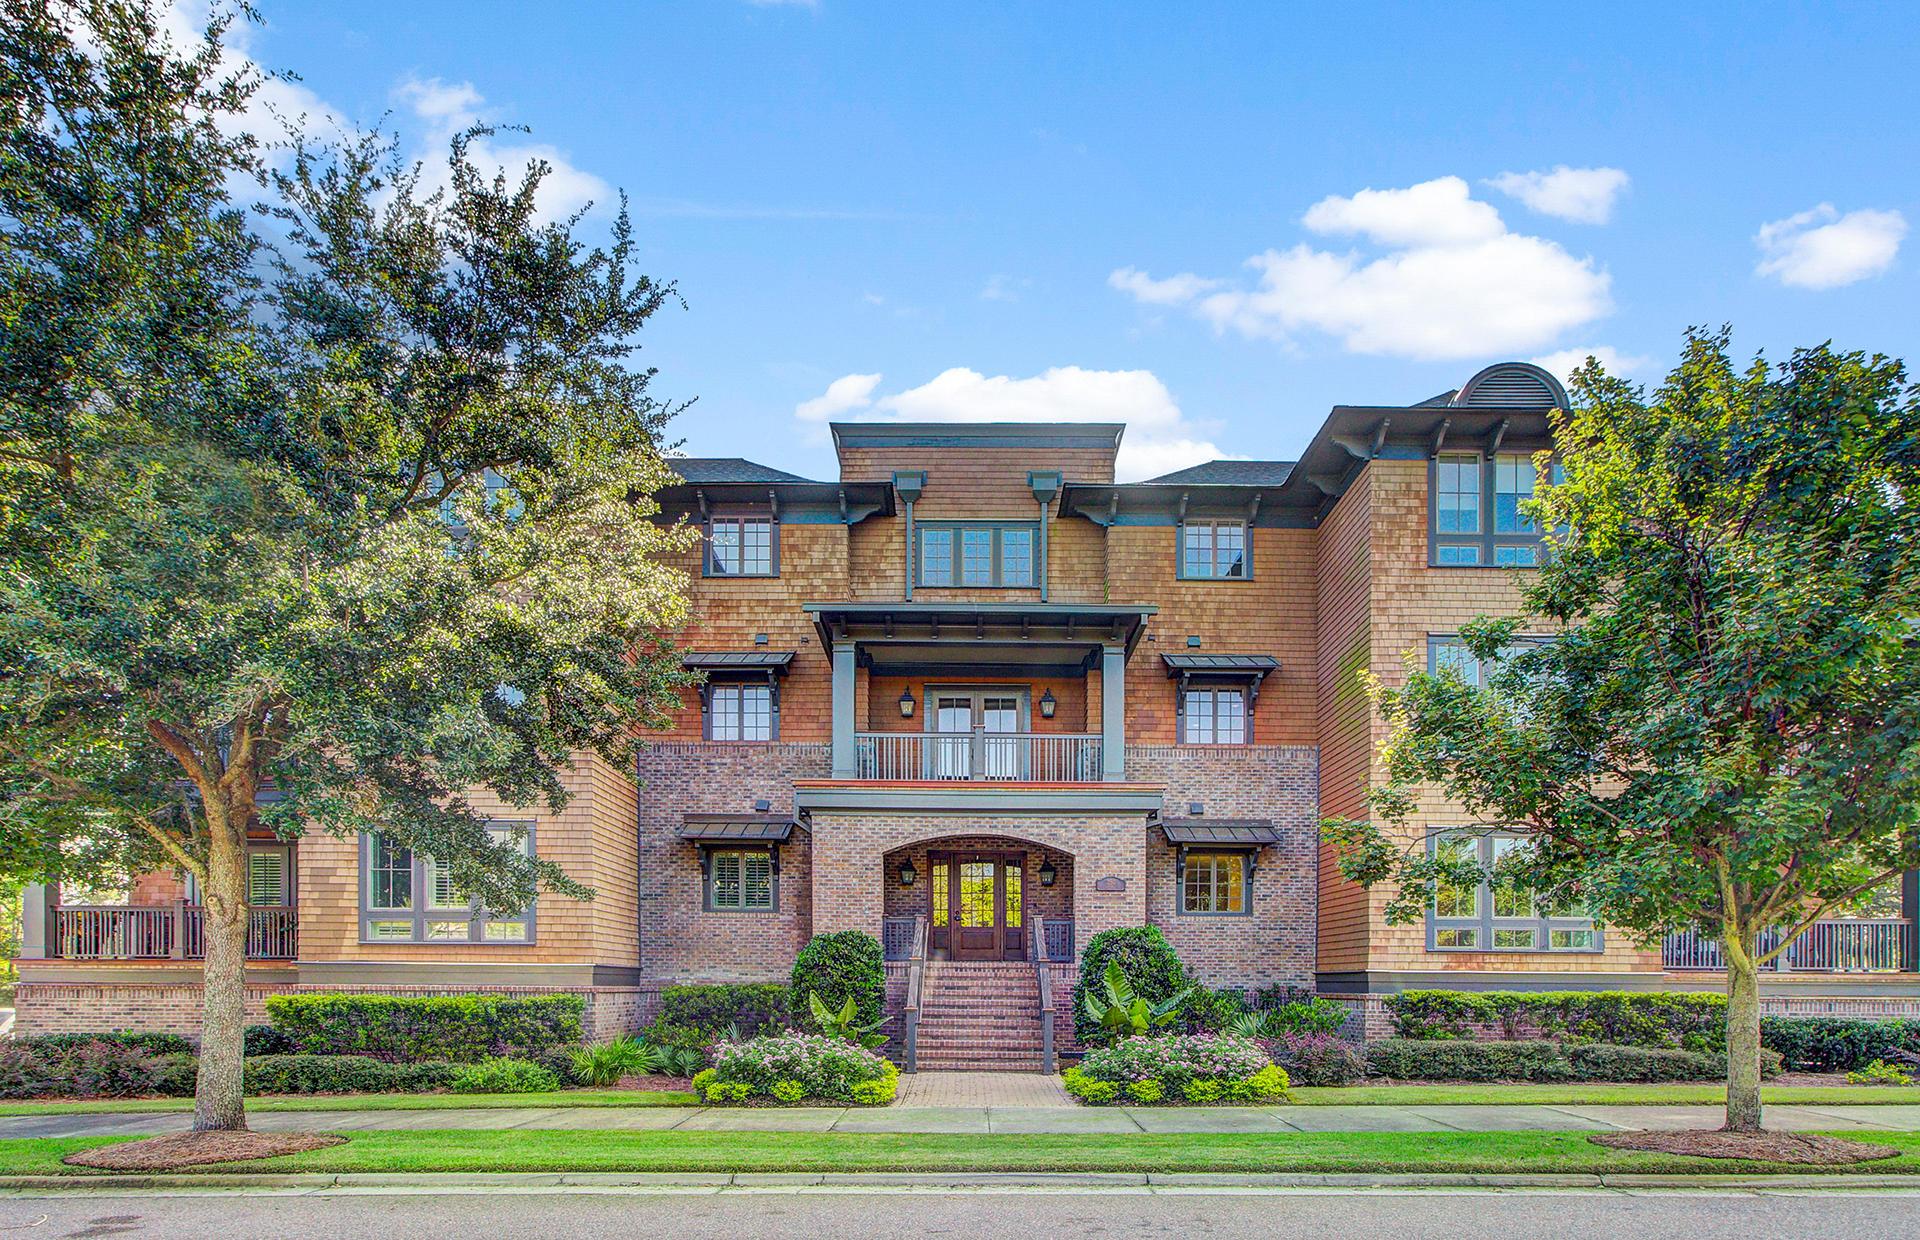 Daniel Island Park Homes For Sale - 250 Island Park, Charleston, SC - 39